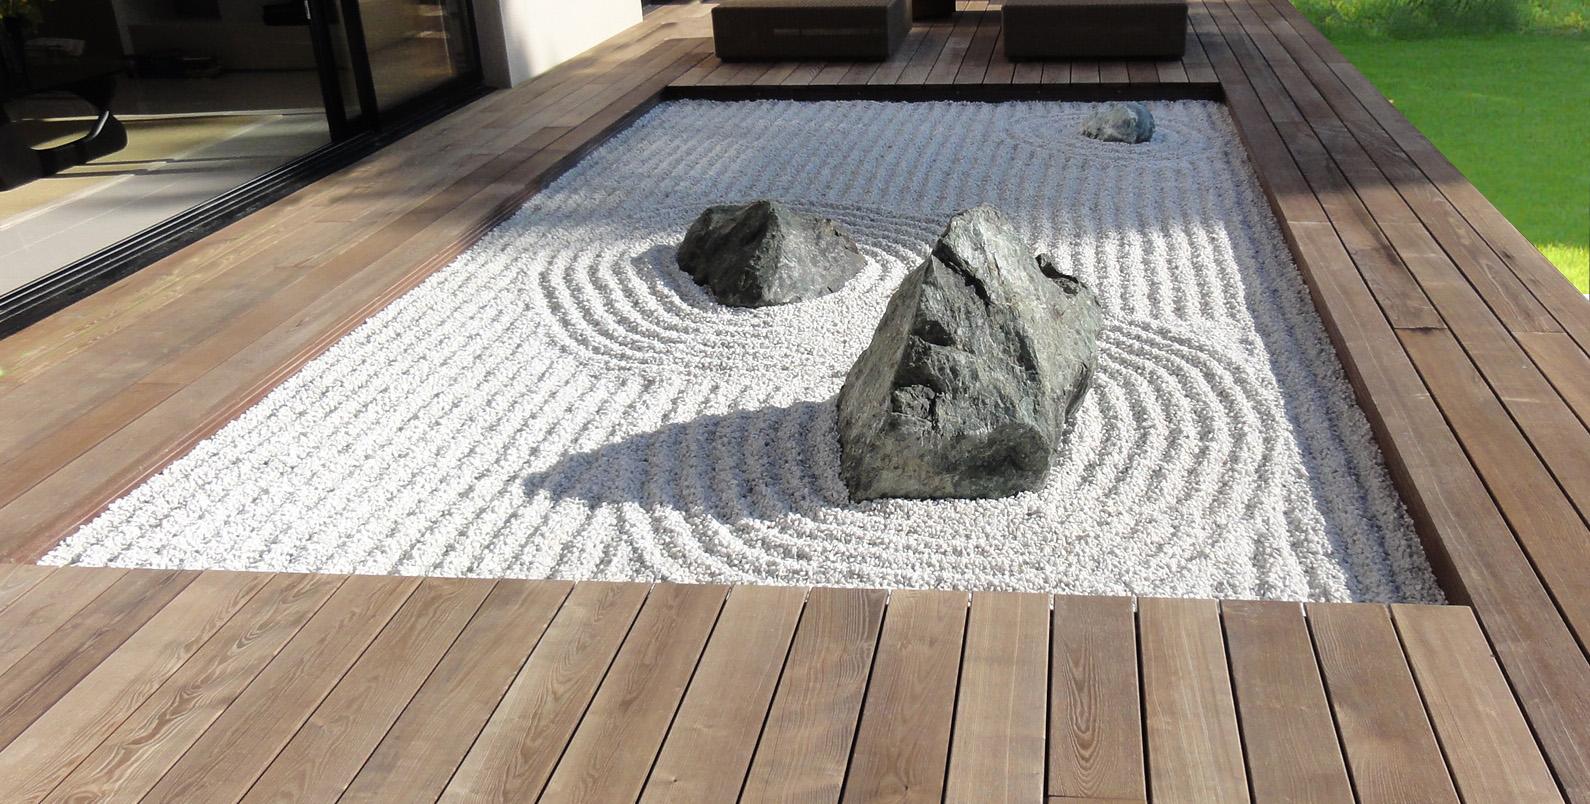 Dossier meditation 2 panorama des lieux de m ditation for Jardin en seine 2015